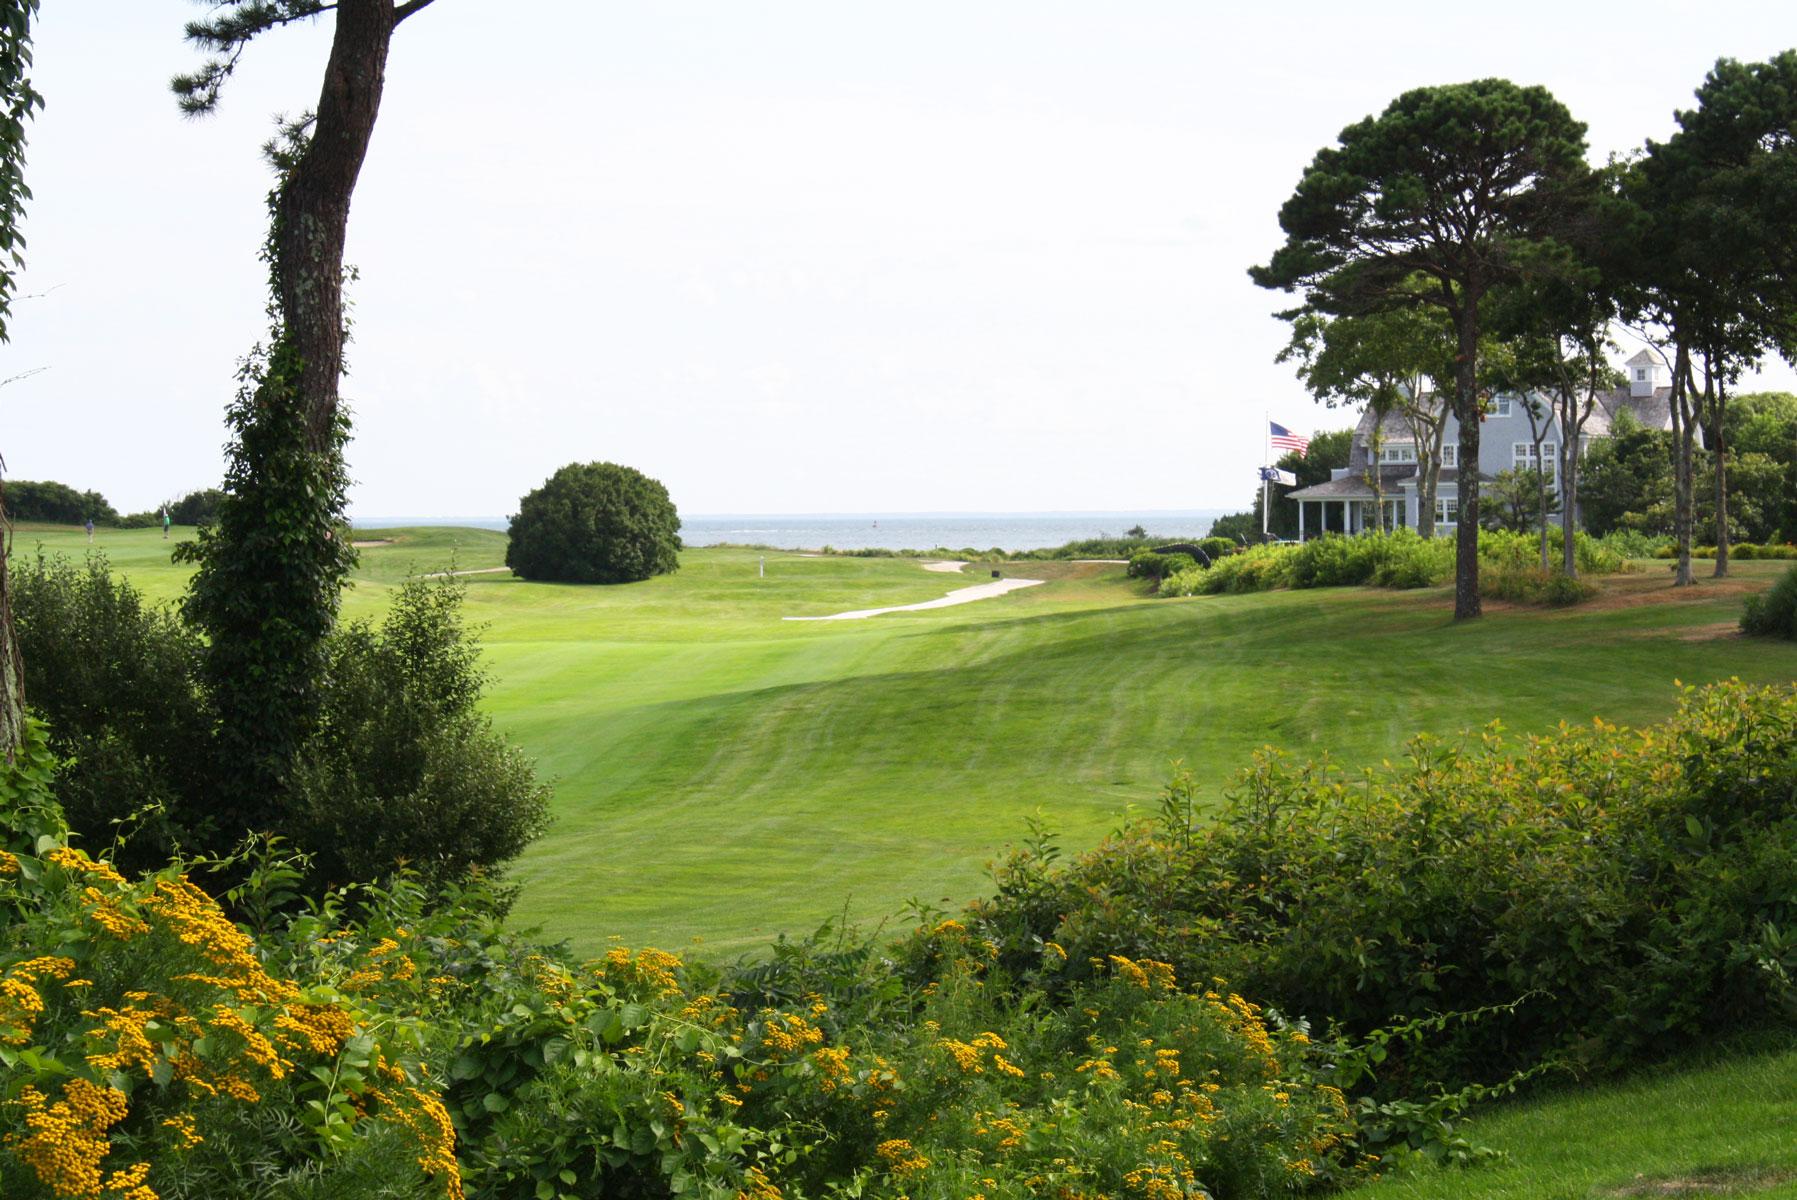 Condominium for Sale at PRISTINE CONDOMINIUM 68 Sea View Lane New Seabury, Massachusetts, 02649 United StatesIn/Around: Mashpee